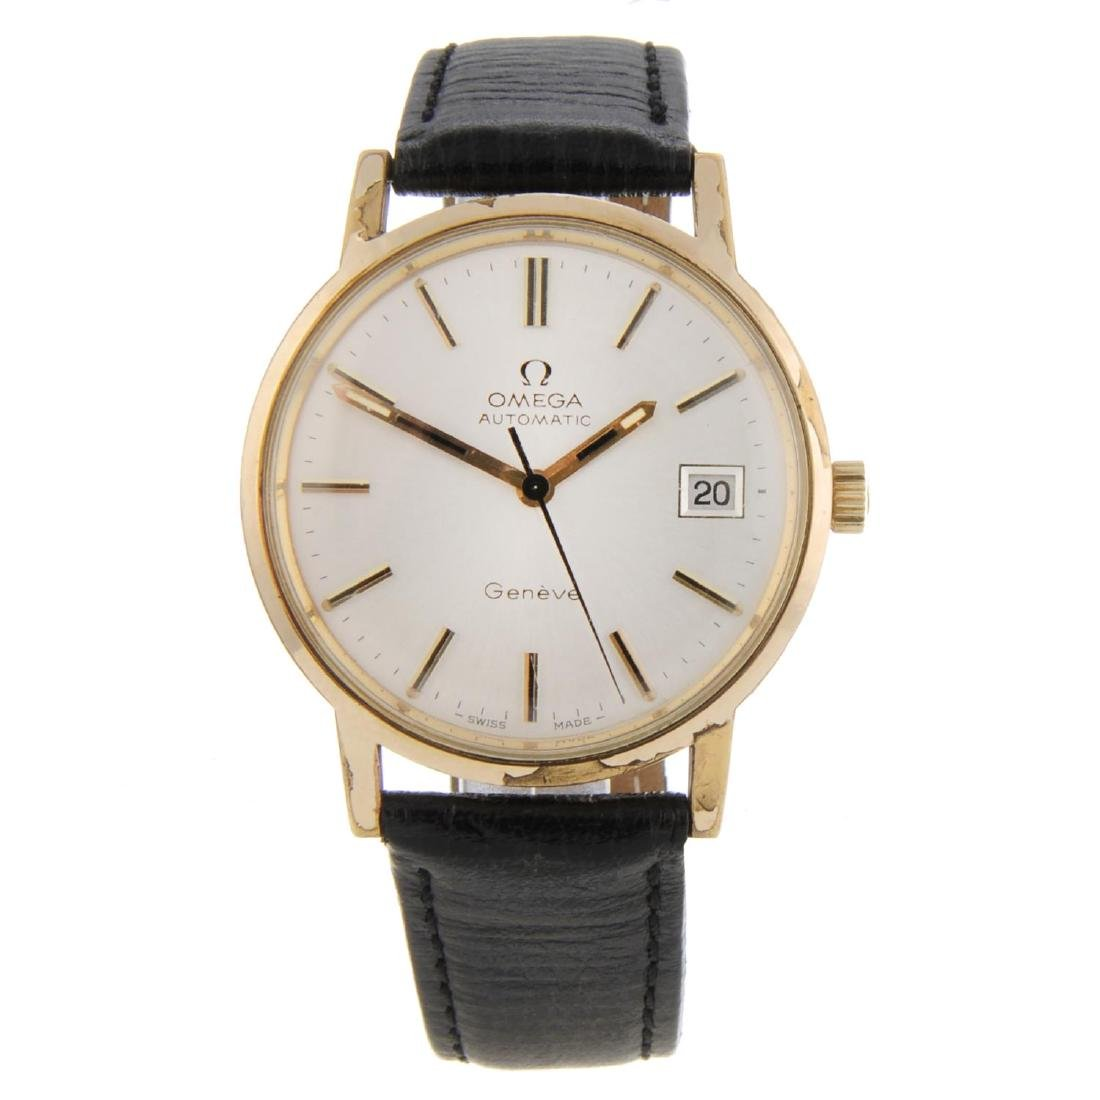 OMEGA - a gentleman's Genève wrist watch. Gold plated